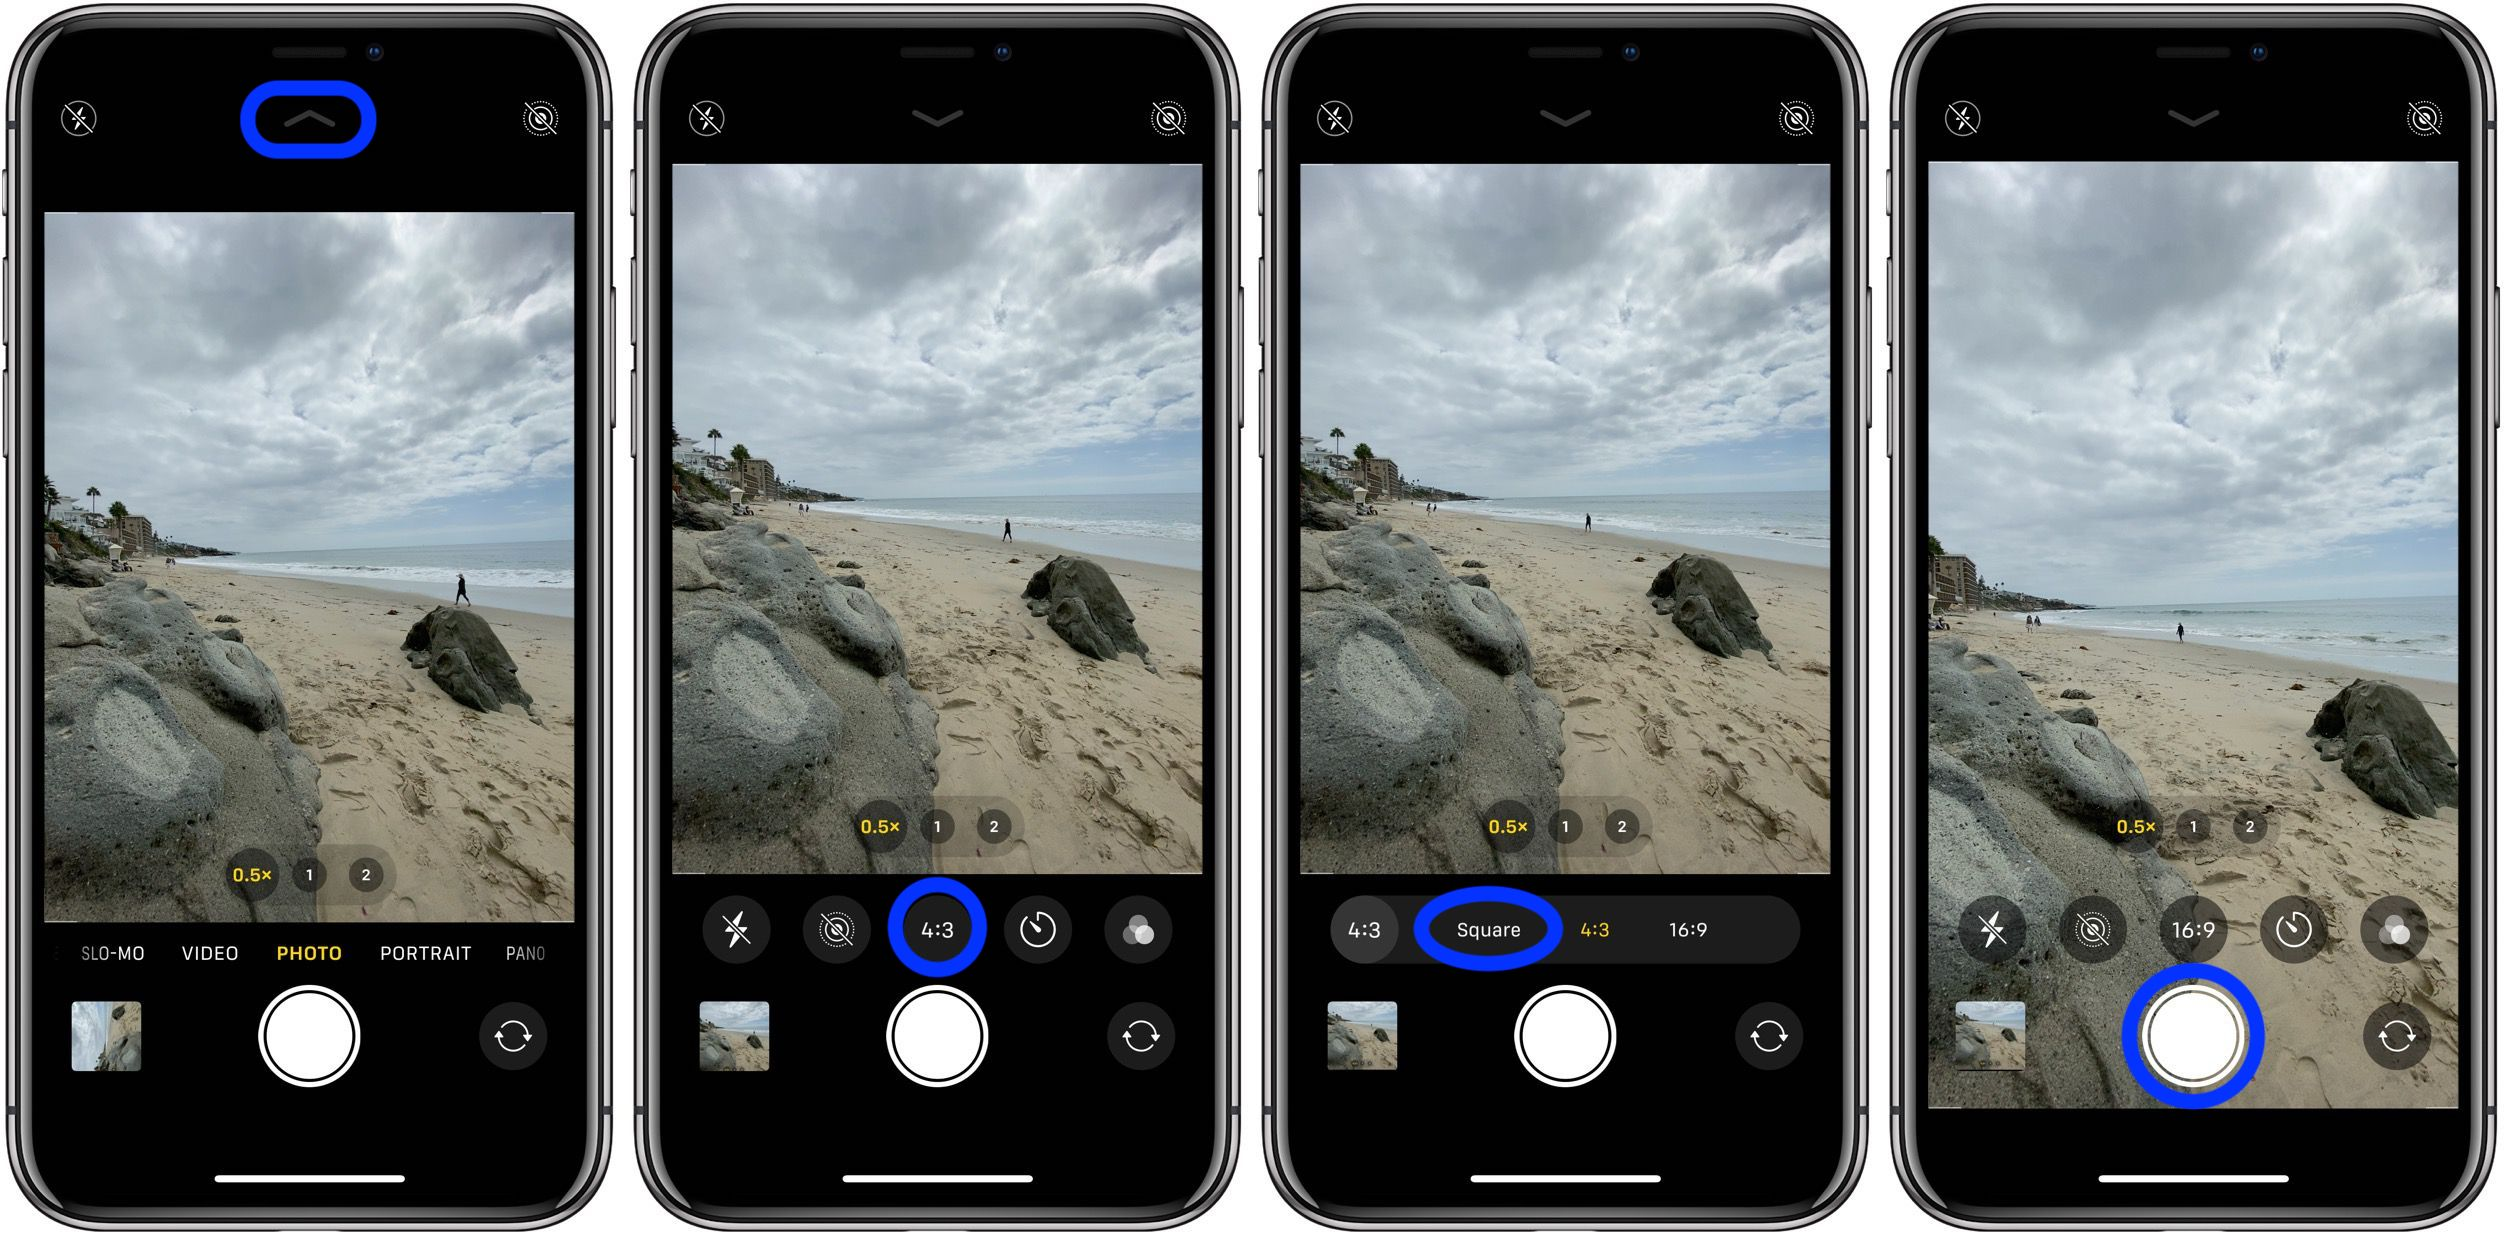 How to take square photos iPhone 11 walkthrough 2